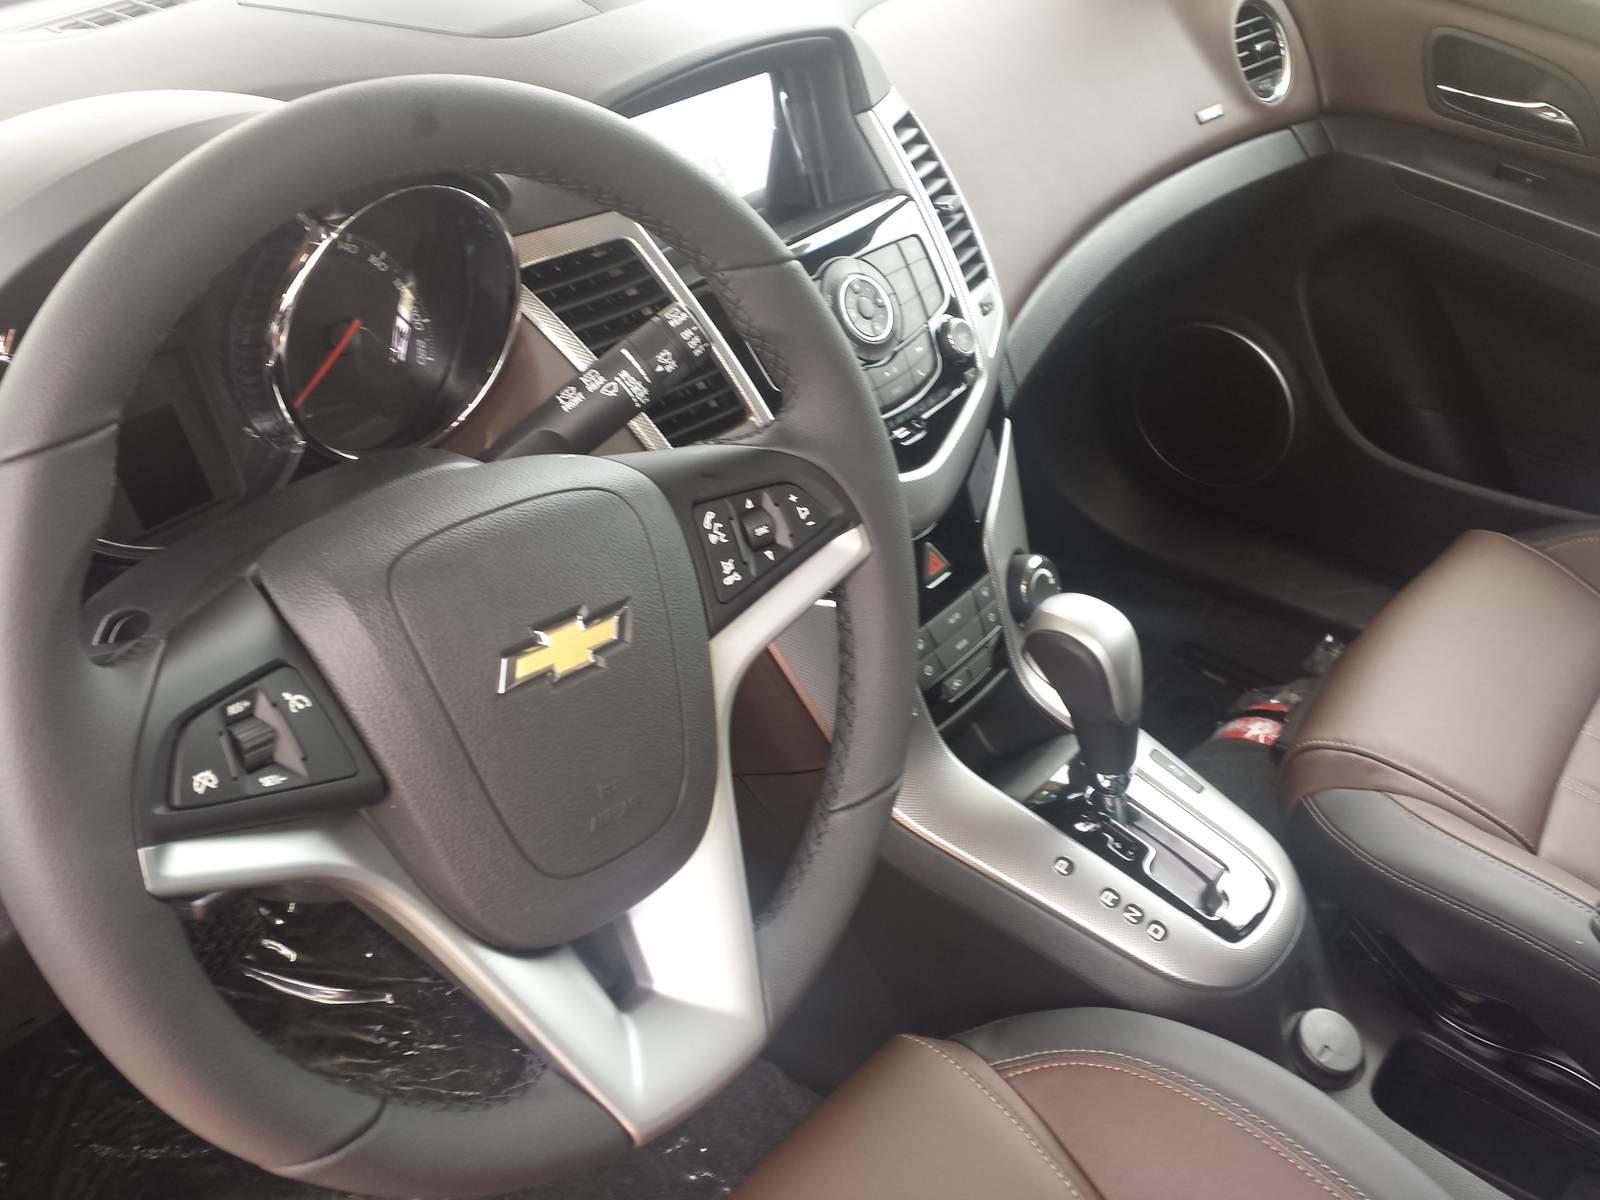 Chevrolet Cruze Hatch LTZ 2015 Preo E Especificaes